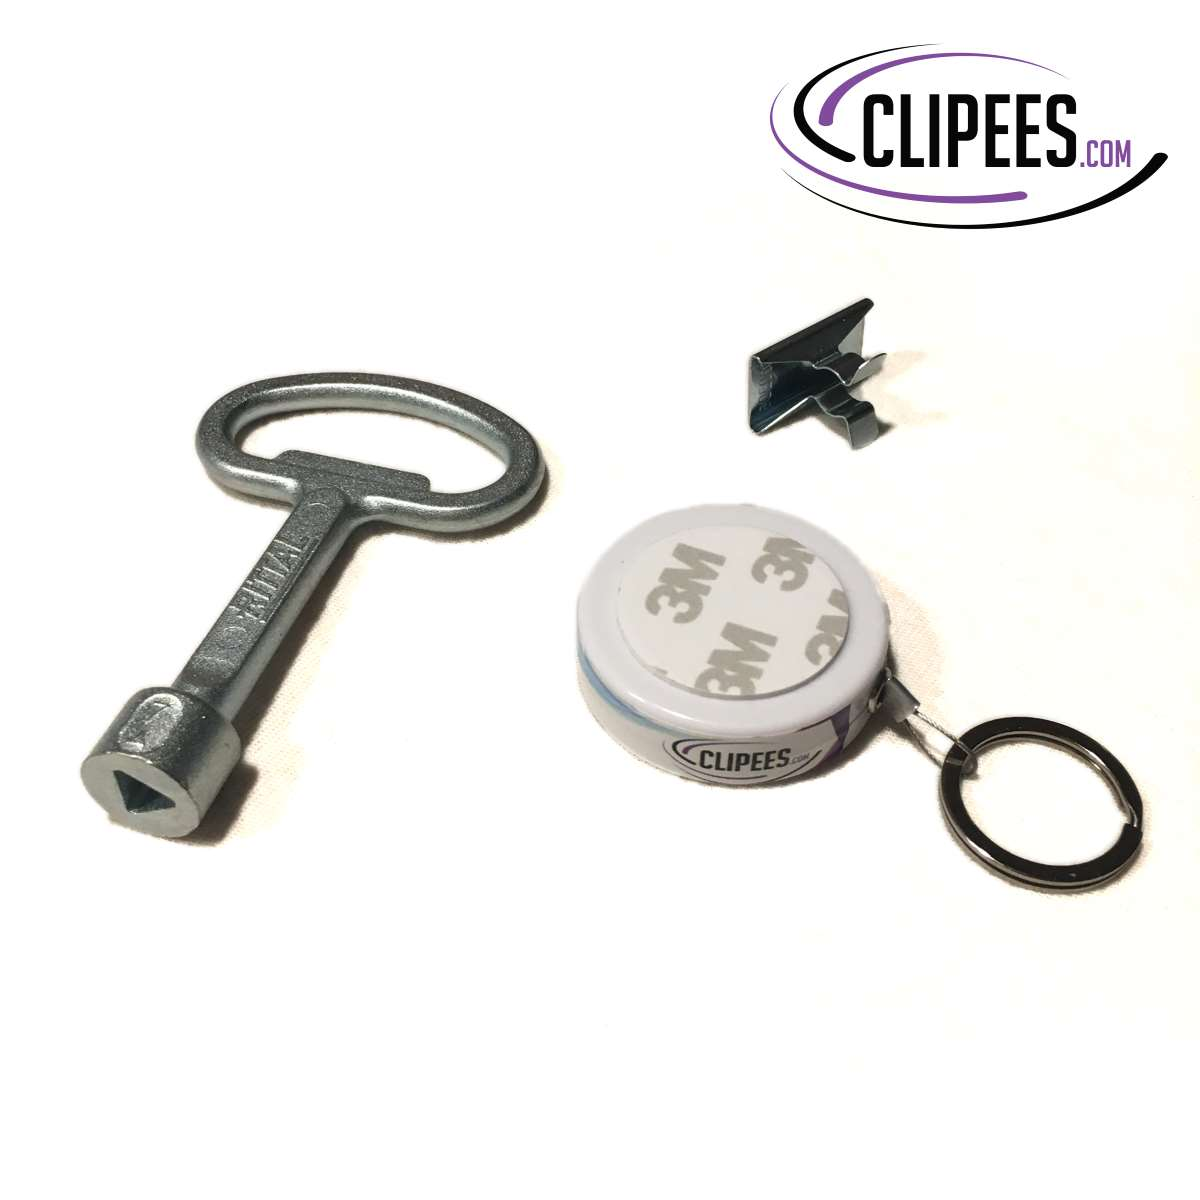 Rittal key 7 mm triangular Clipees kit white